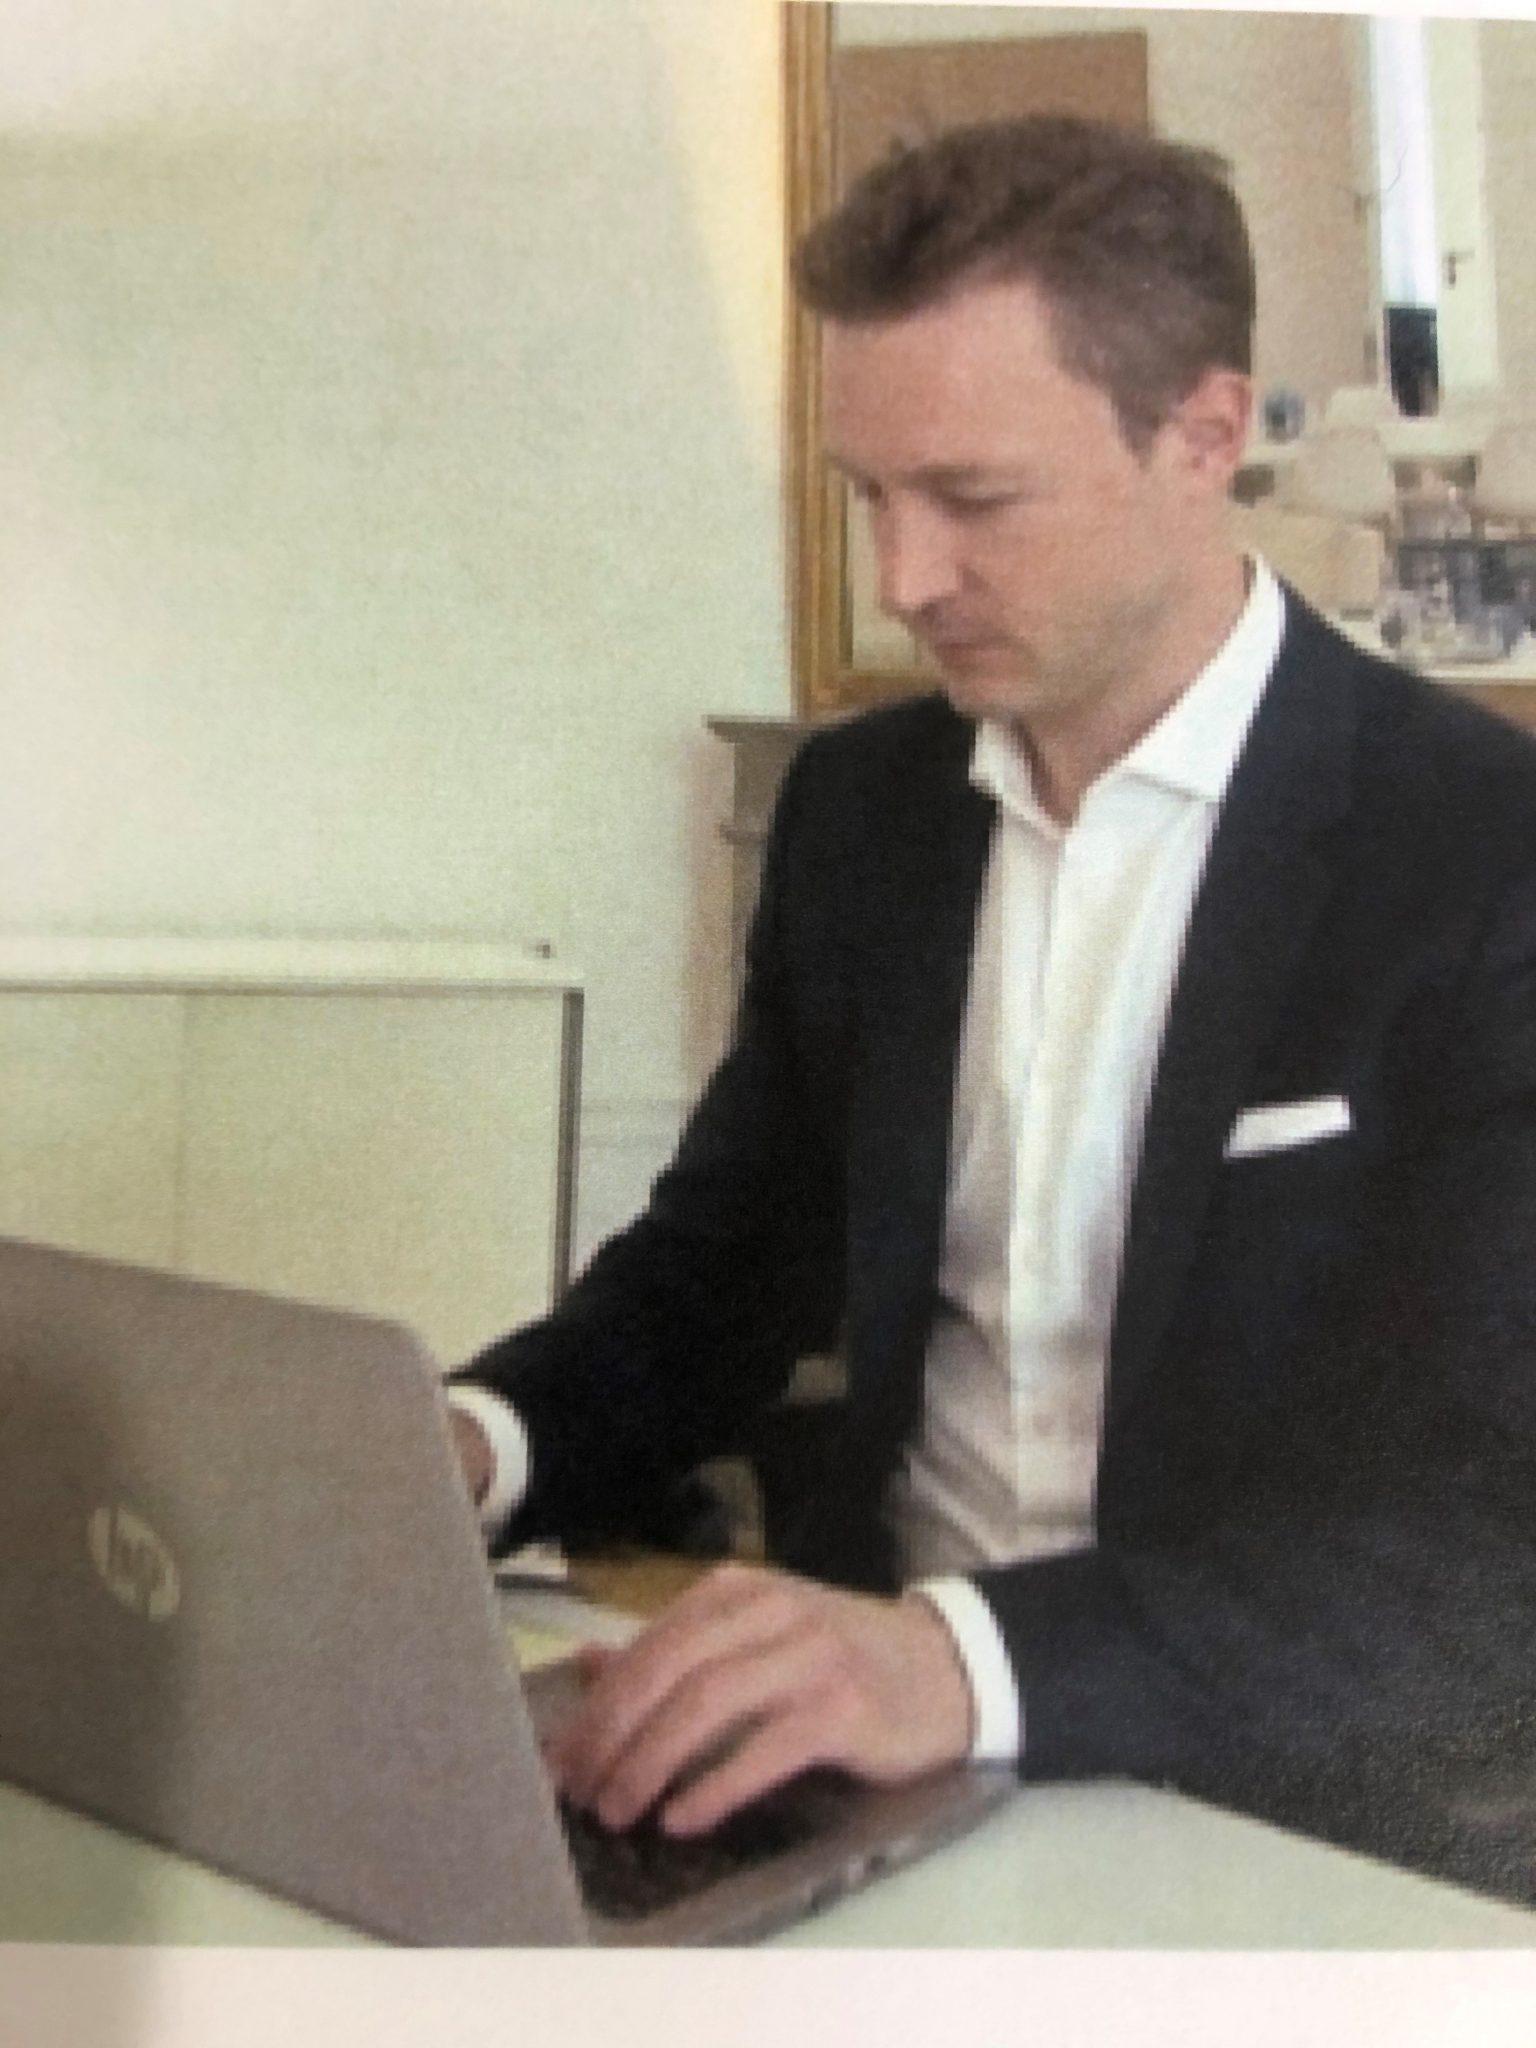 Bildergebnis für kontrast blümel laptop